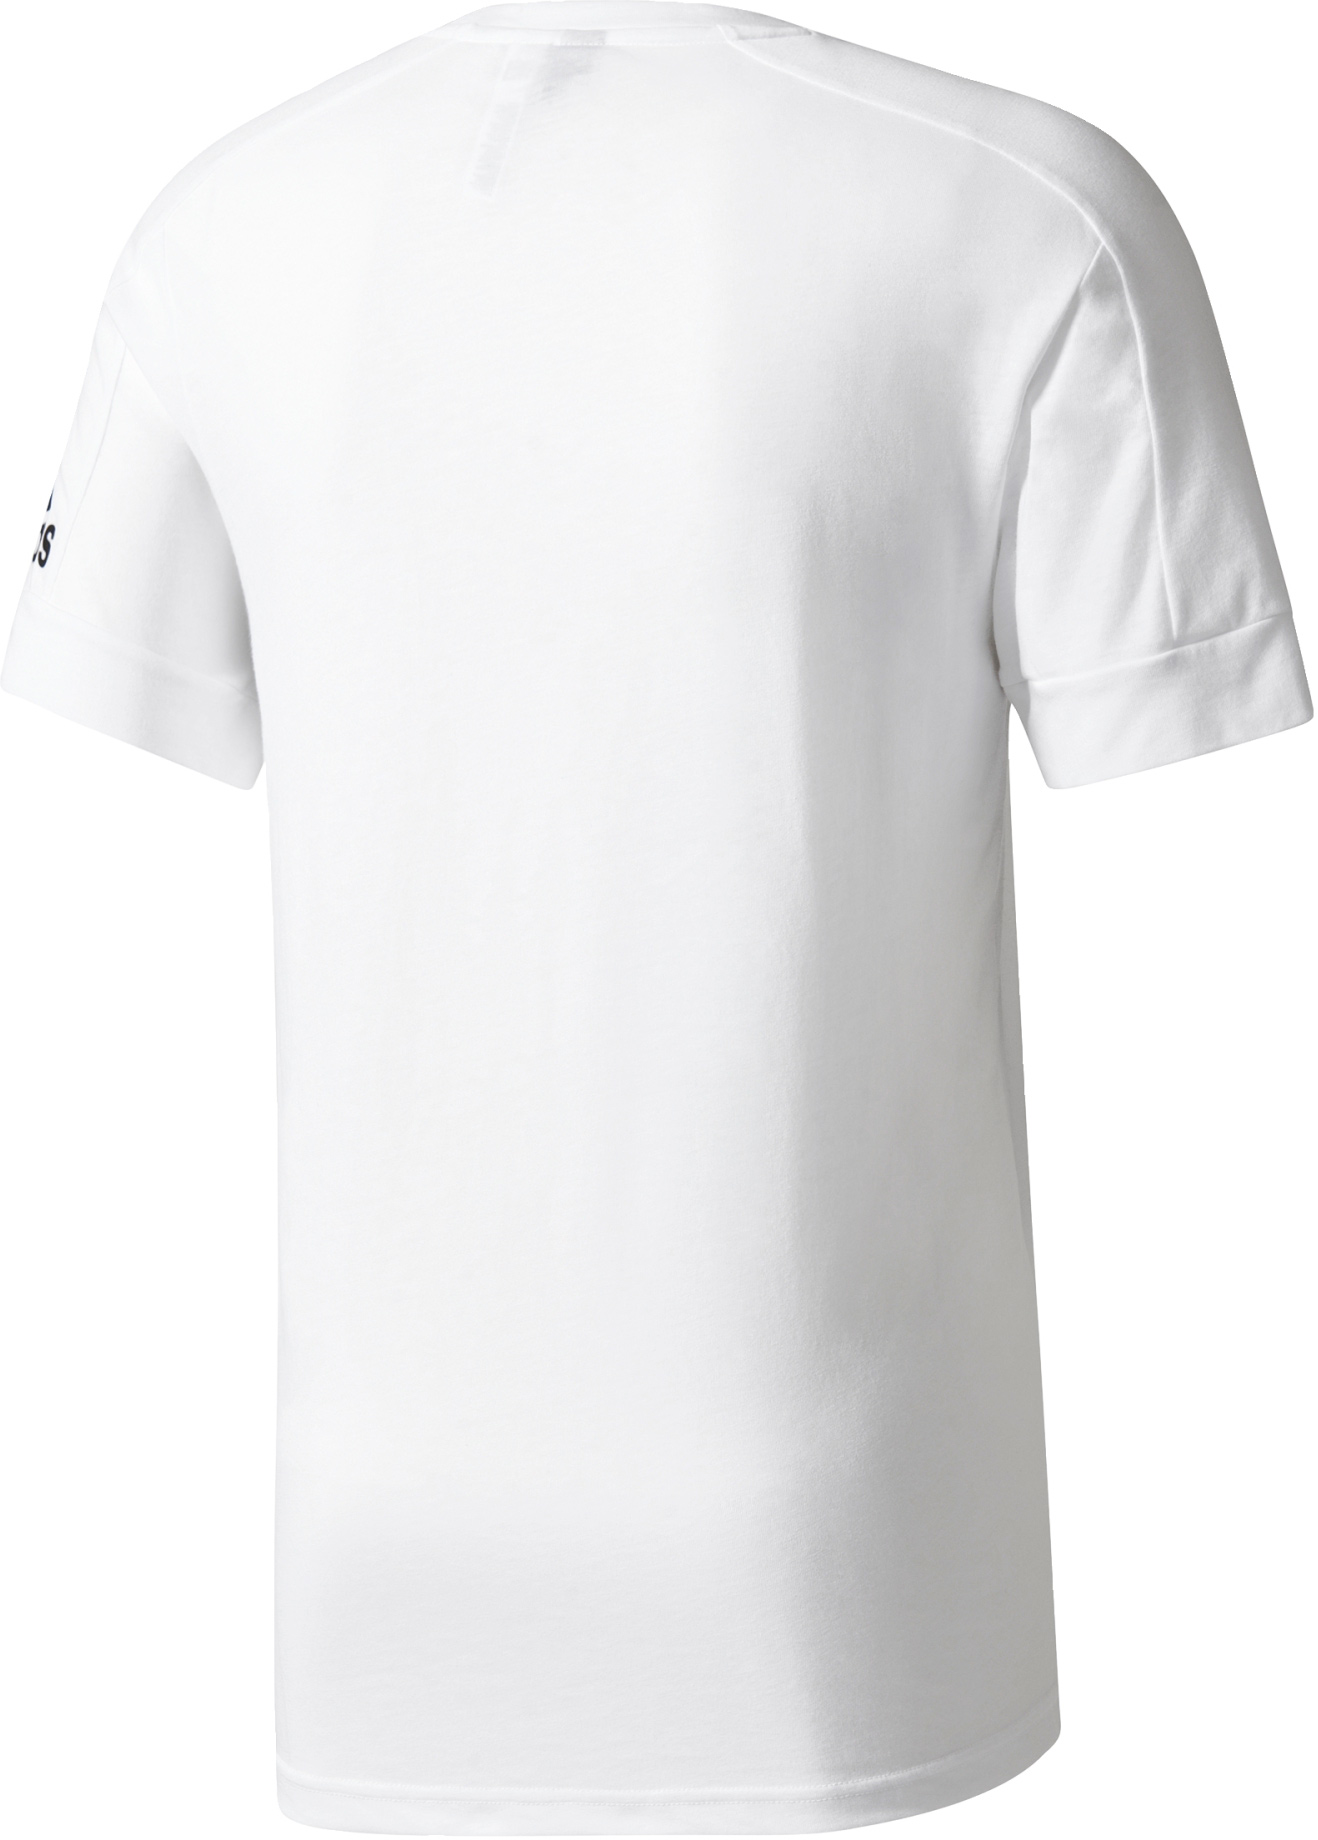 6de7eeded95b adidas ID STADIUM TEE. Pánské tričko. Pánské tričko